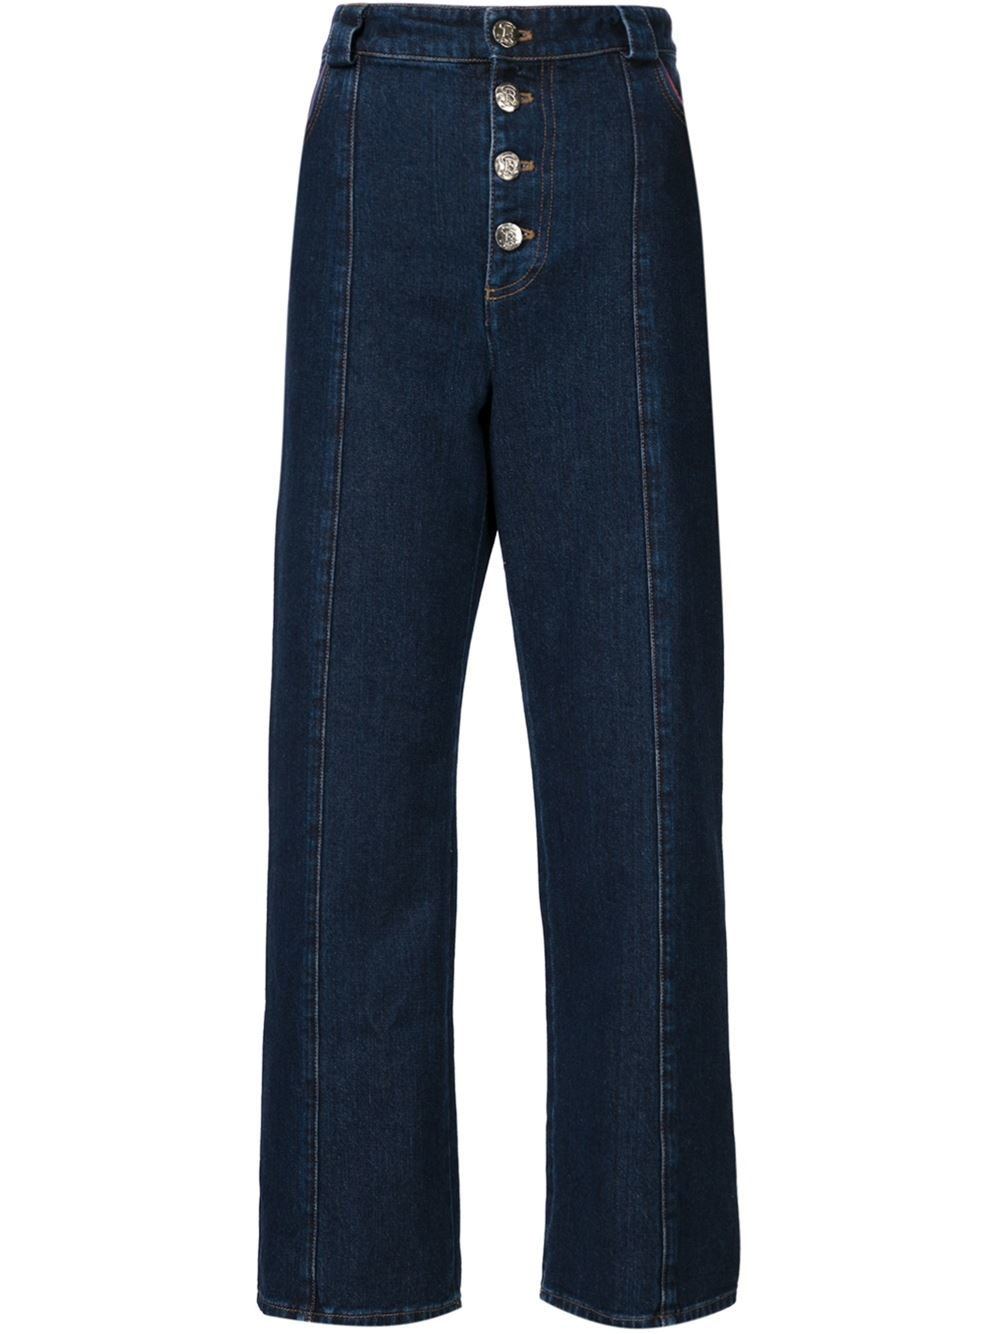 Sonia rykiel High-waisted Jeans in Blue | Lyst